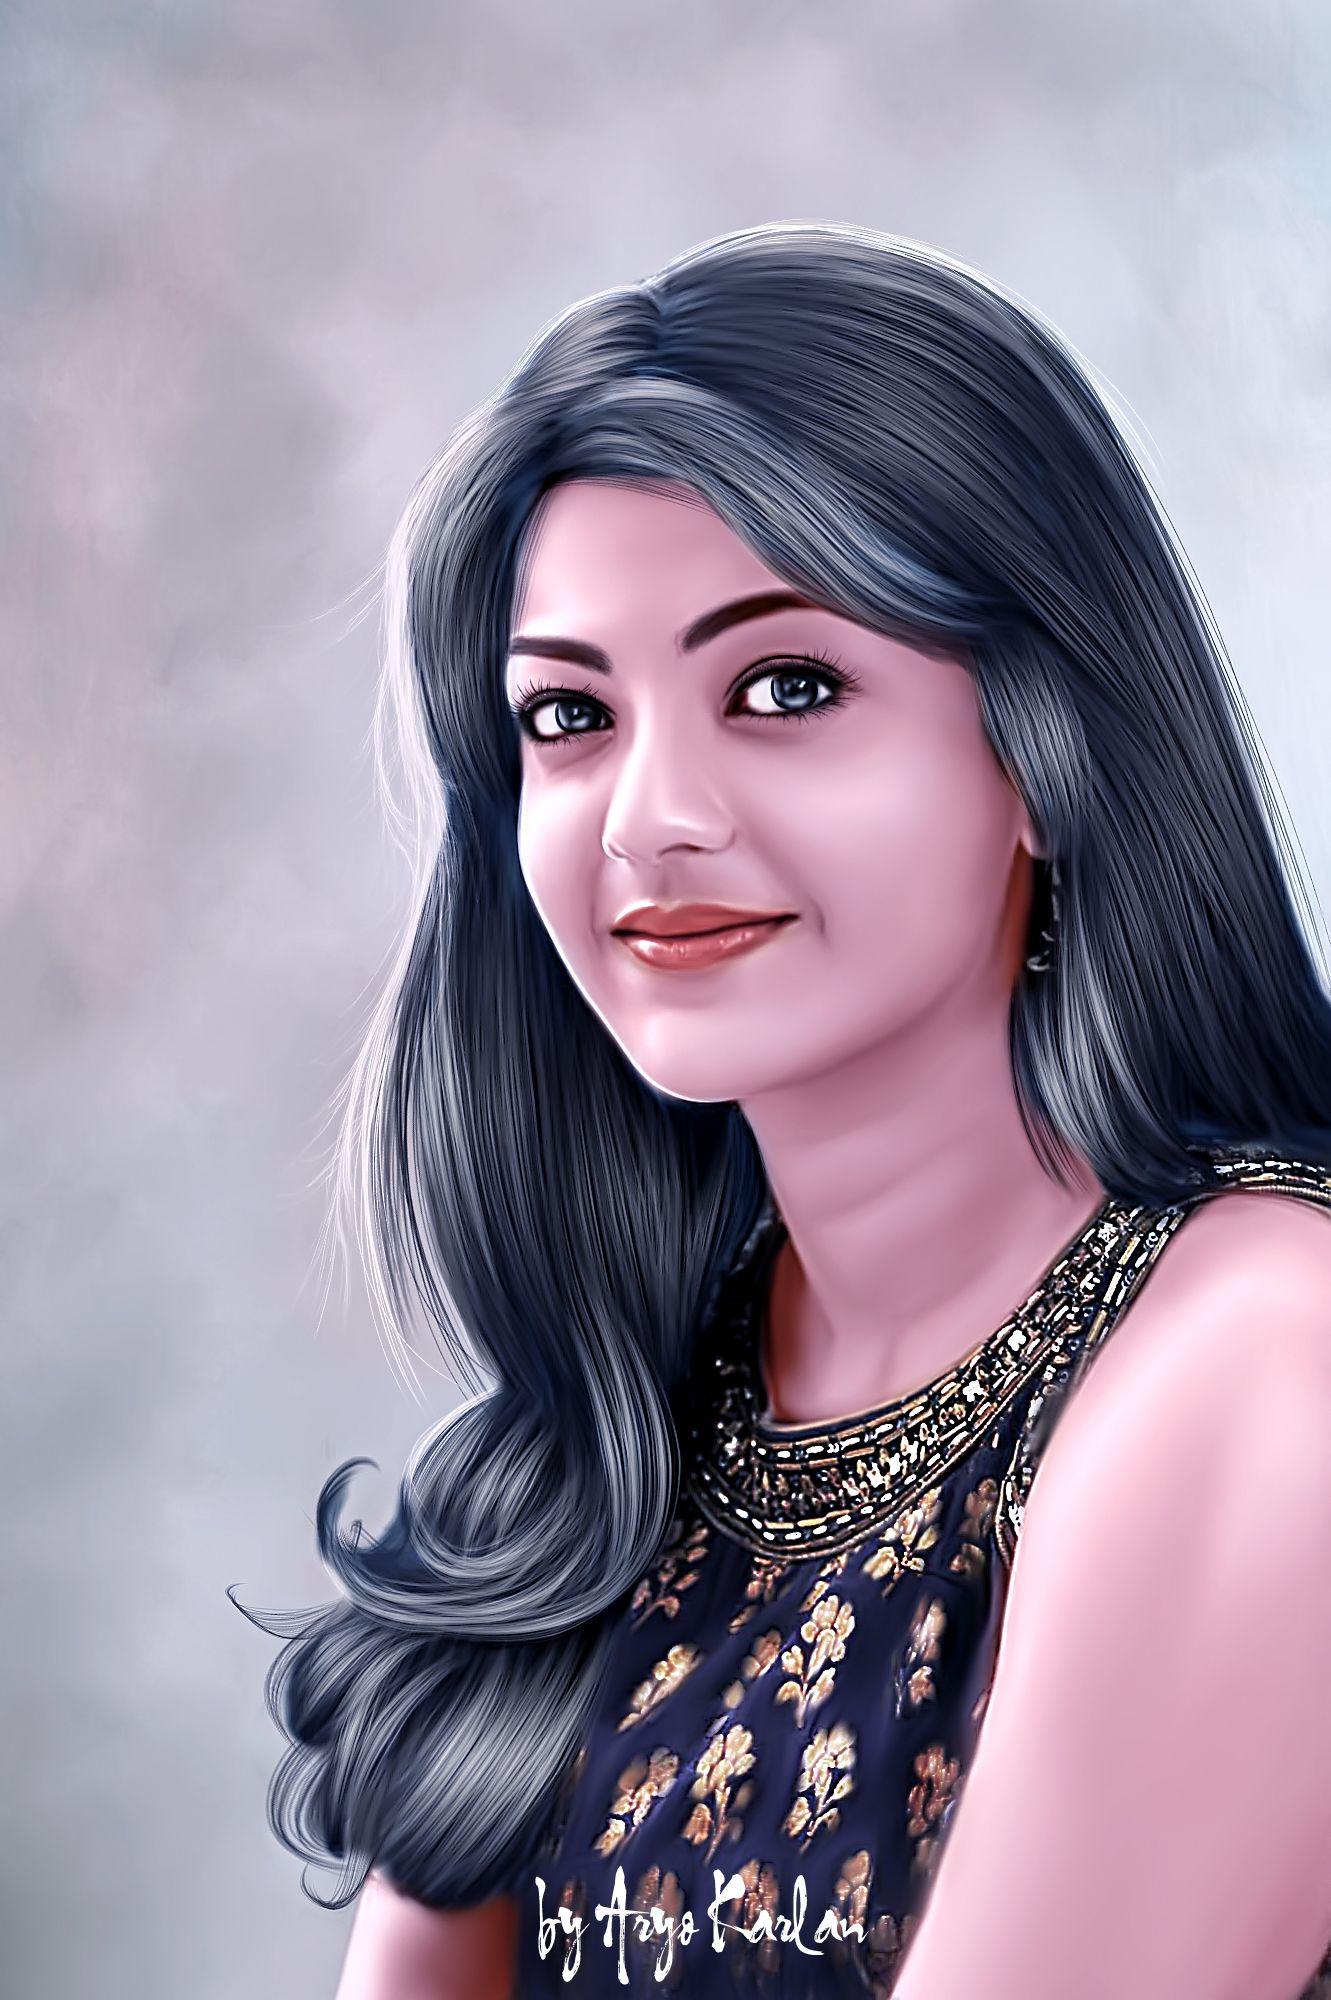 Aryo karlan indian women painting beautiful girl face